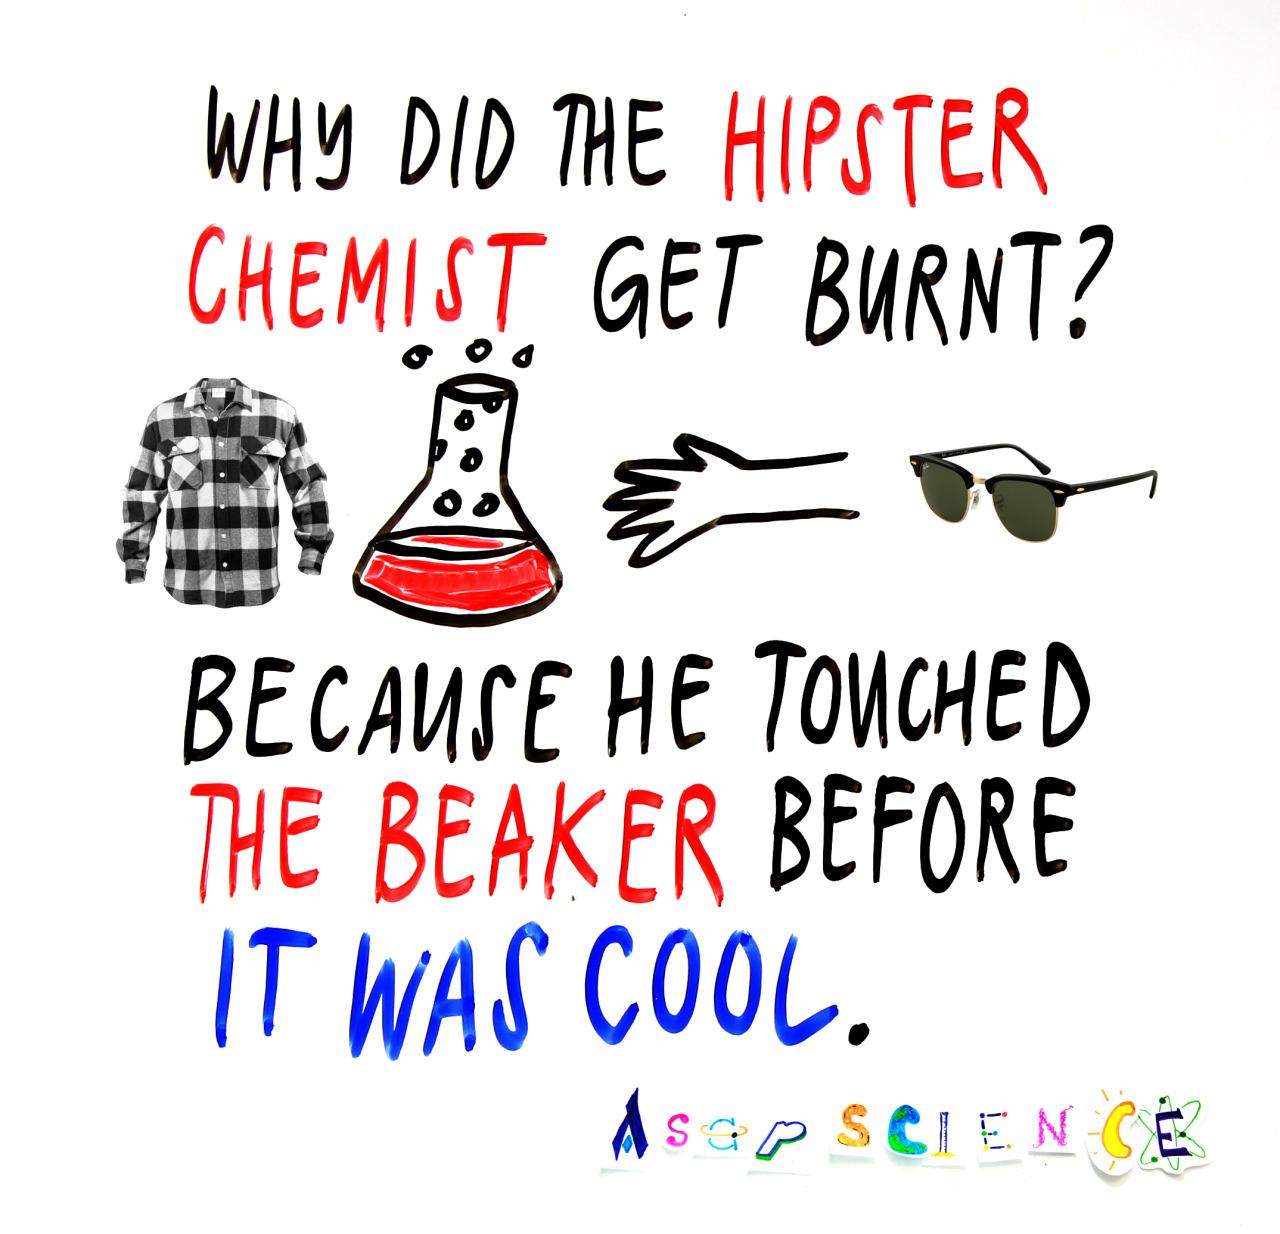 hipster-science.jpg